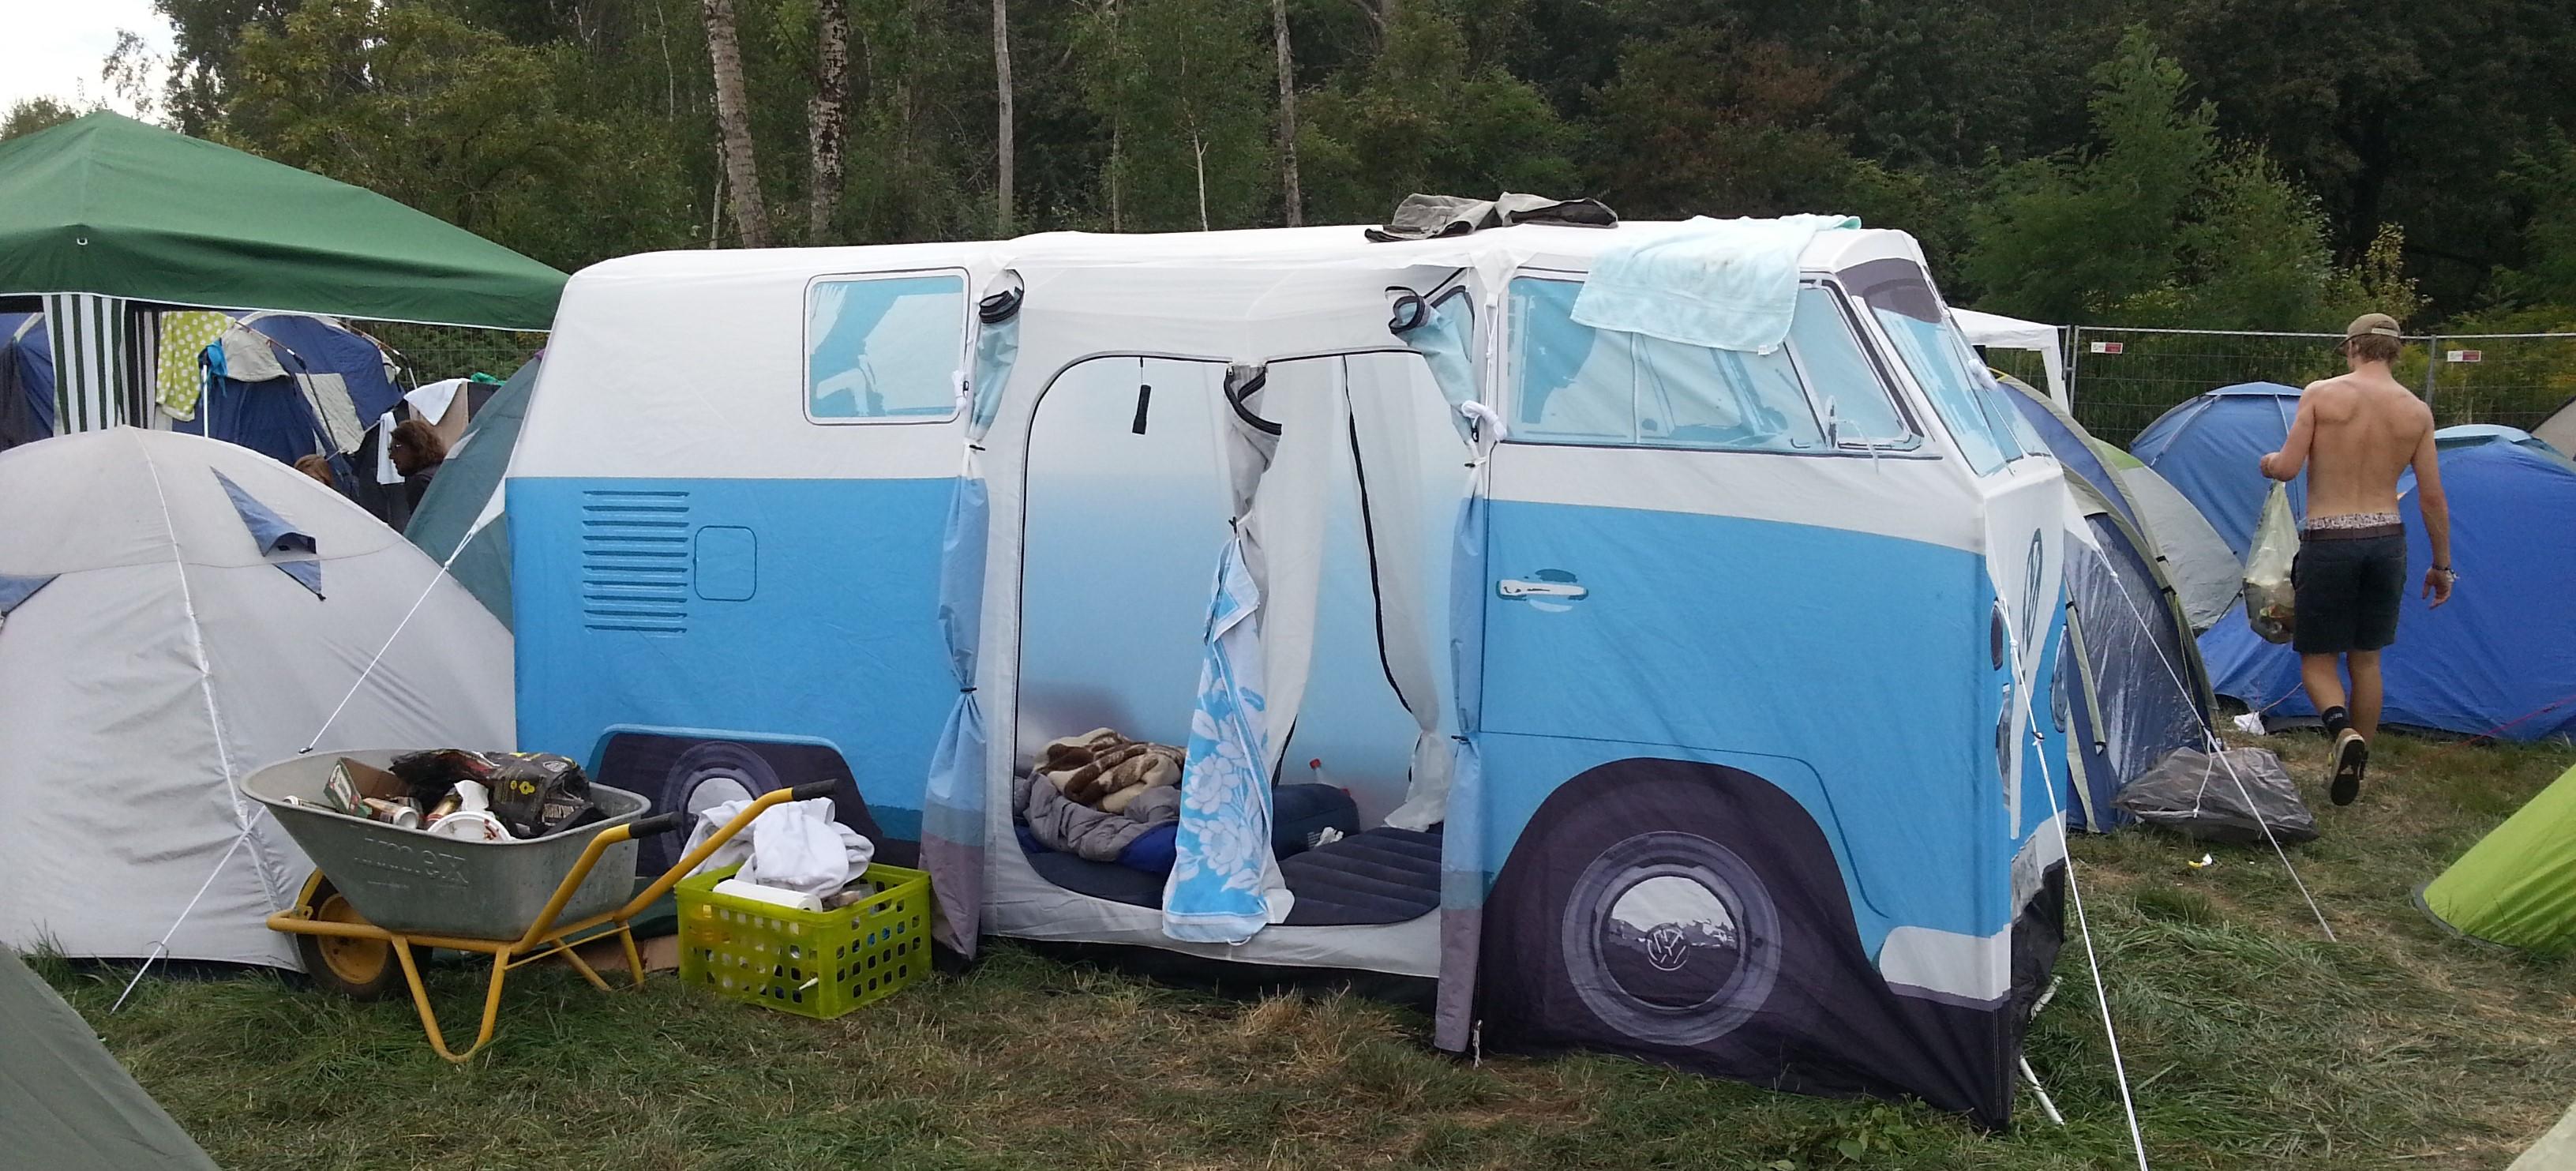 festival gadgets campingplatz zelt vw bus festival. Black Bedroom Furniture Sets. Home Design Ideas